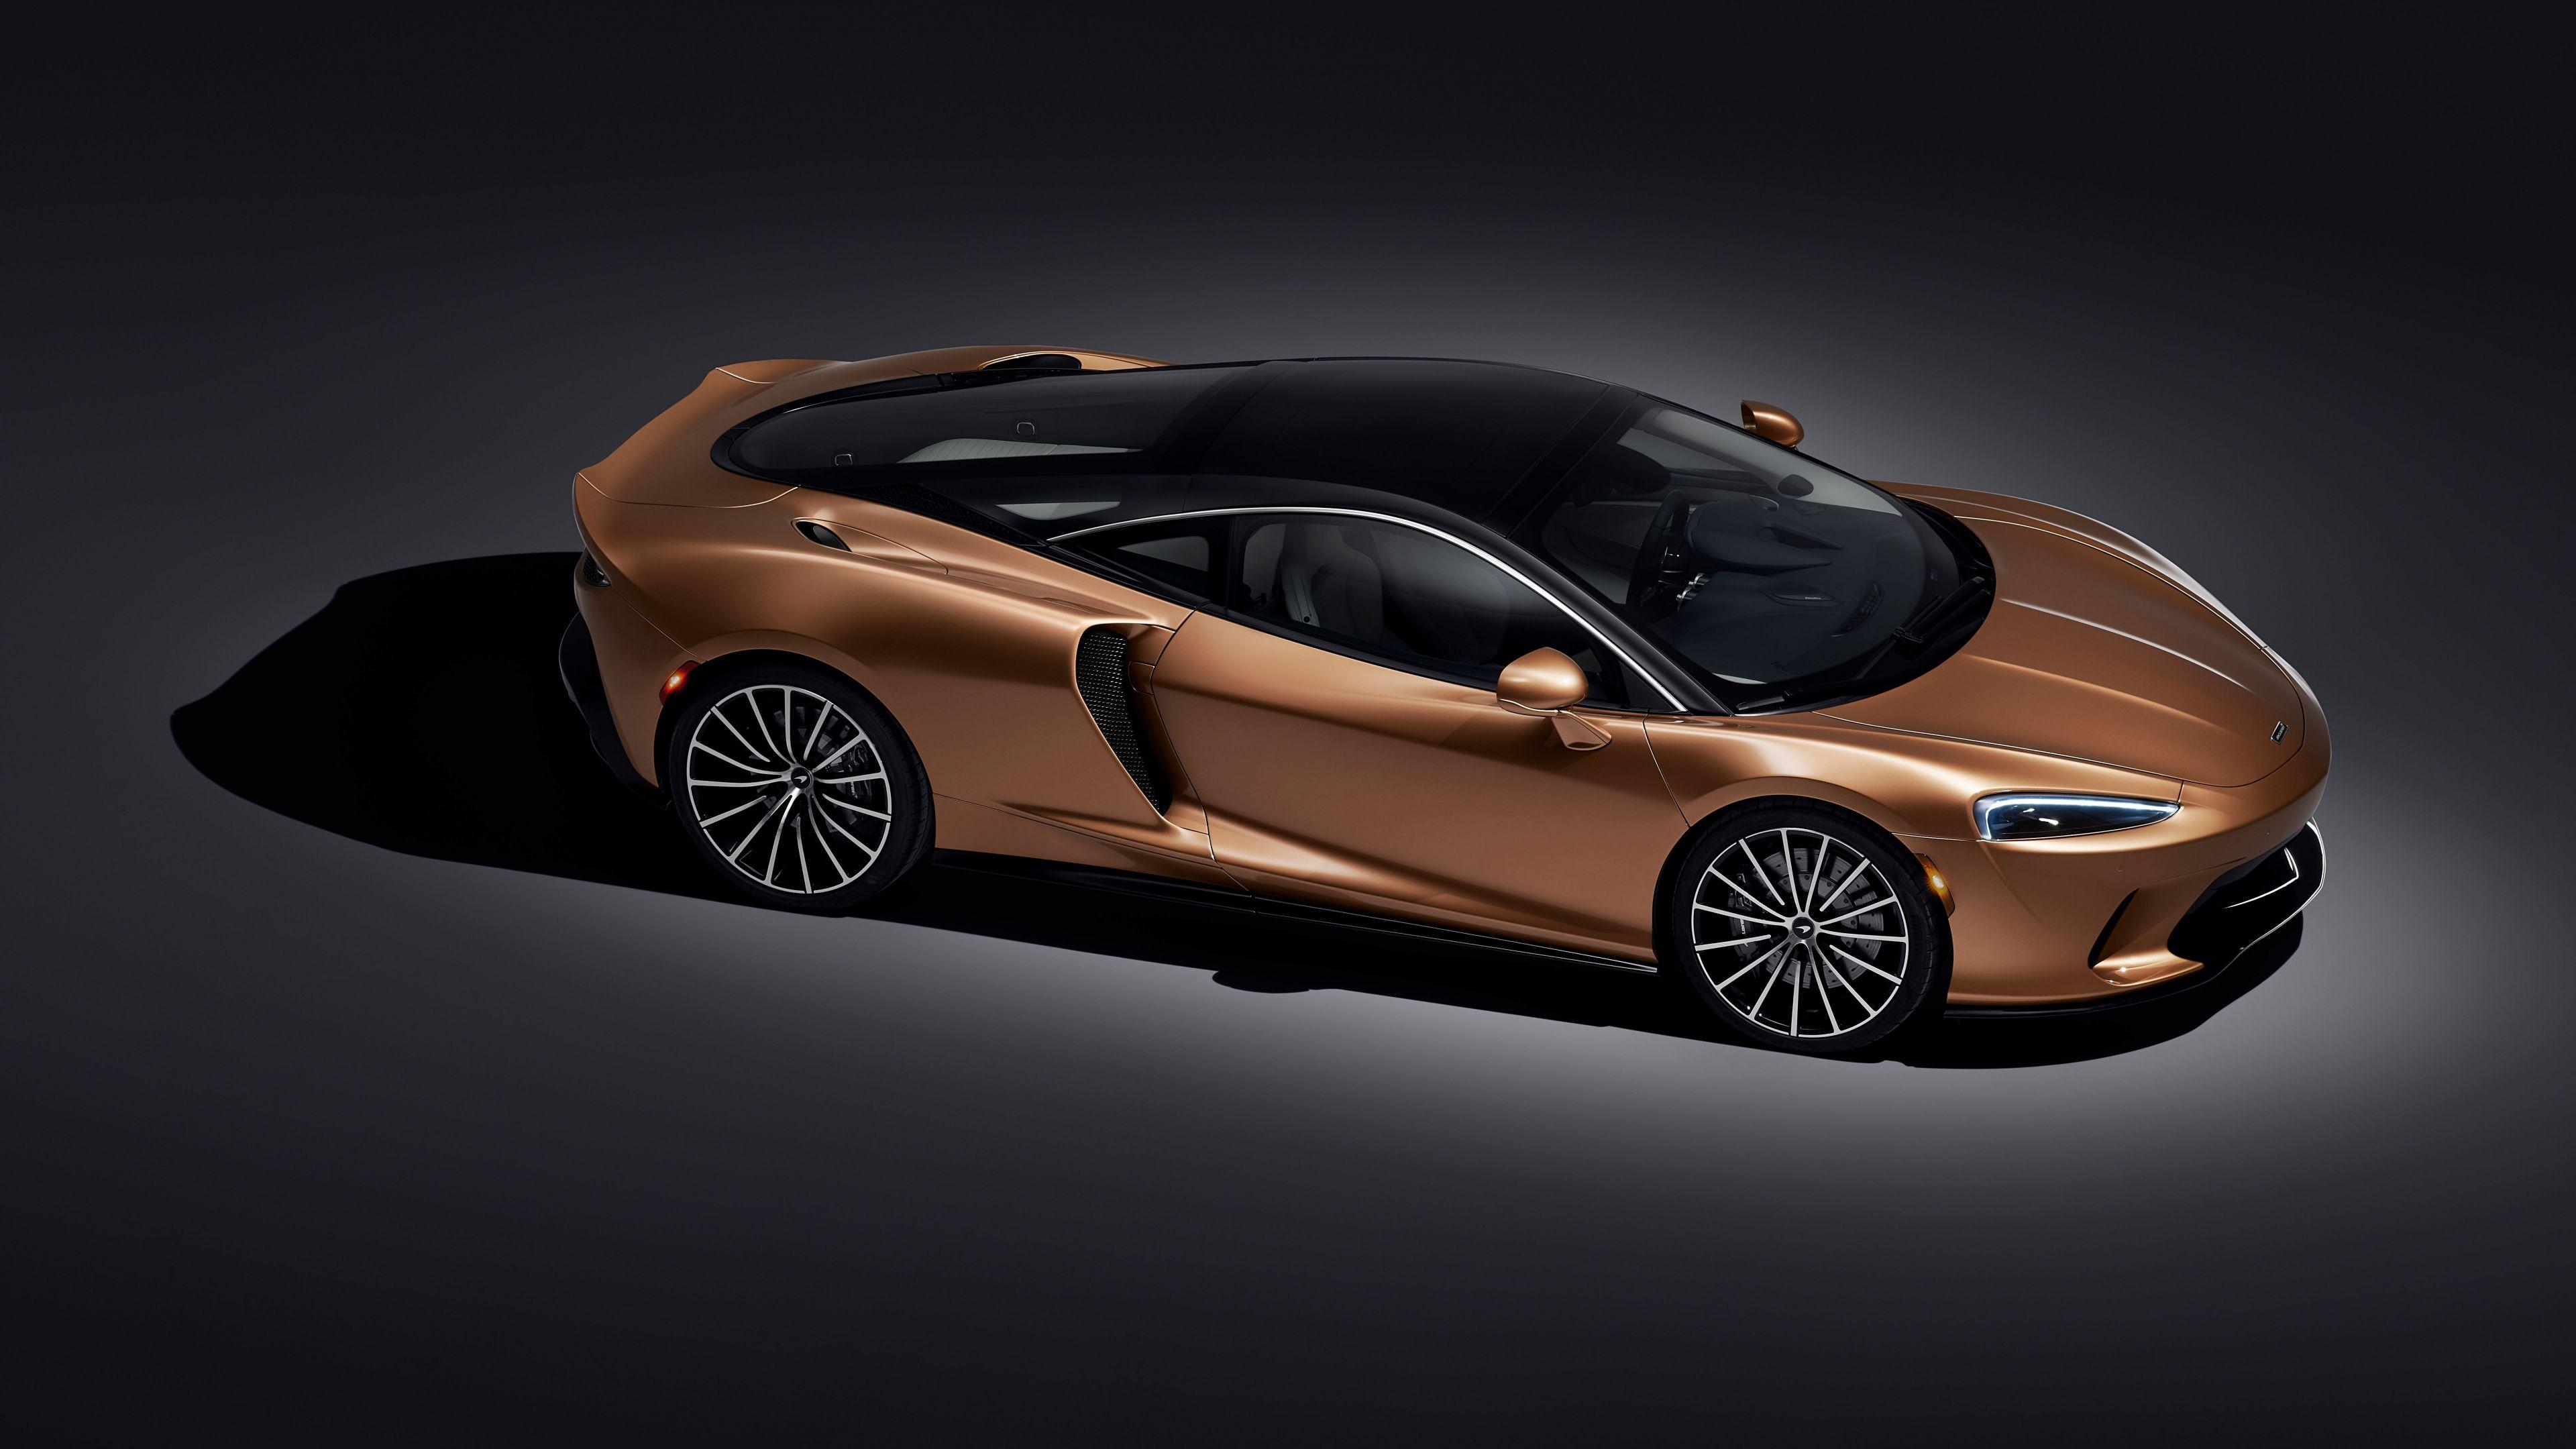 3840x2160 McLaren car, McLaren GT, 2019 wallpaper Super